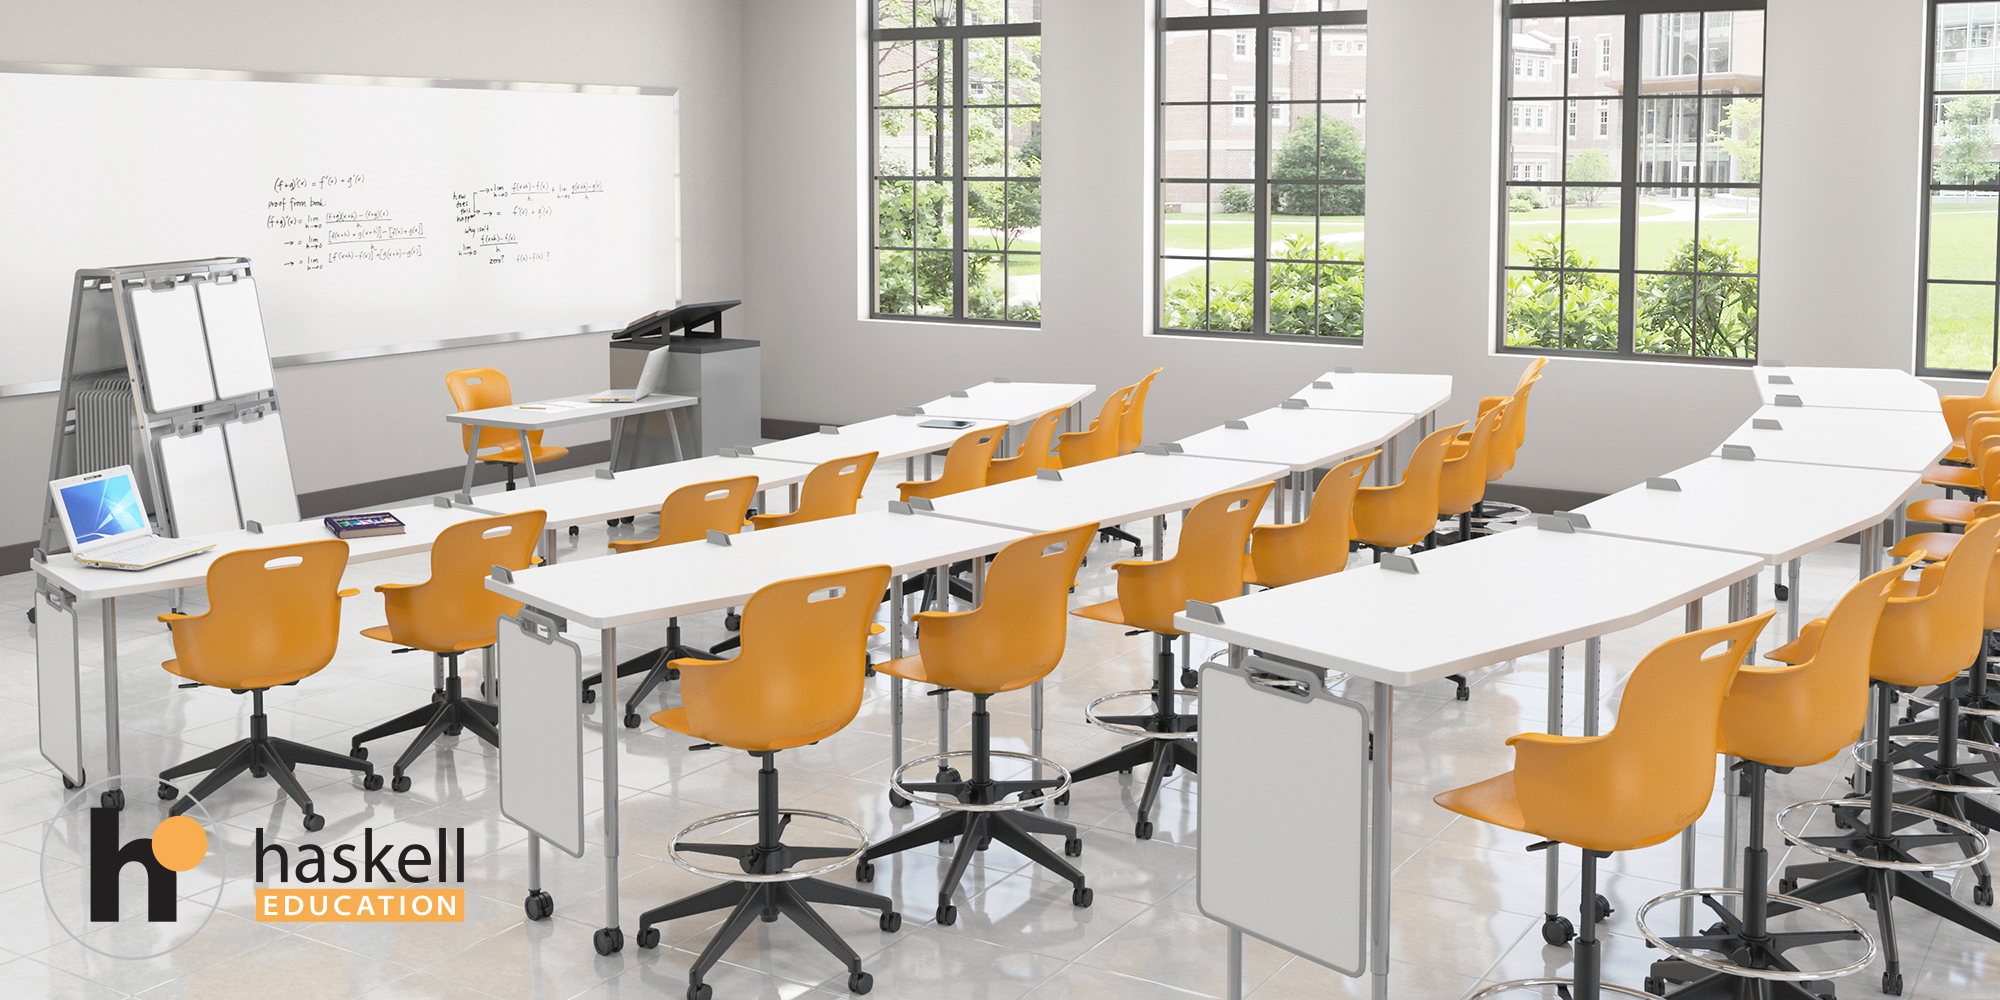 Stadium Seating Classroom FIVE STAR AngleShot